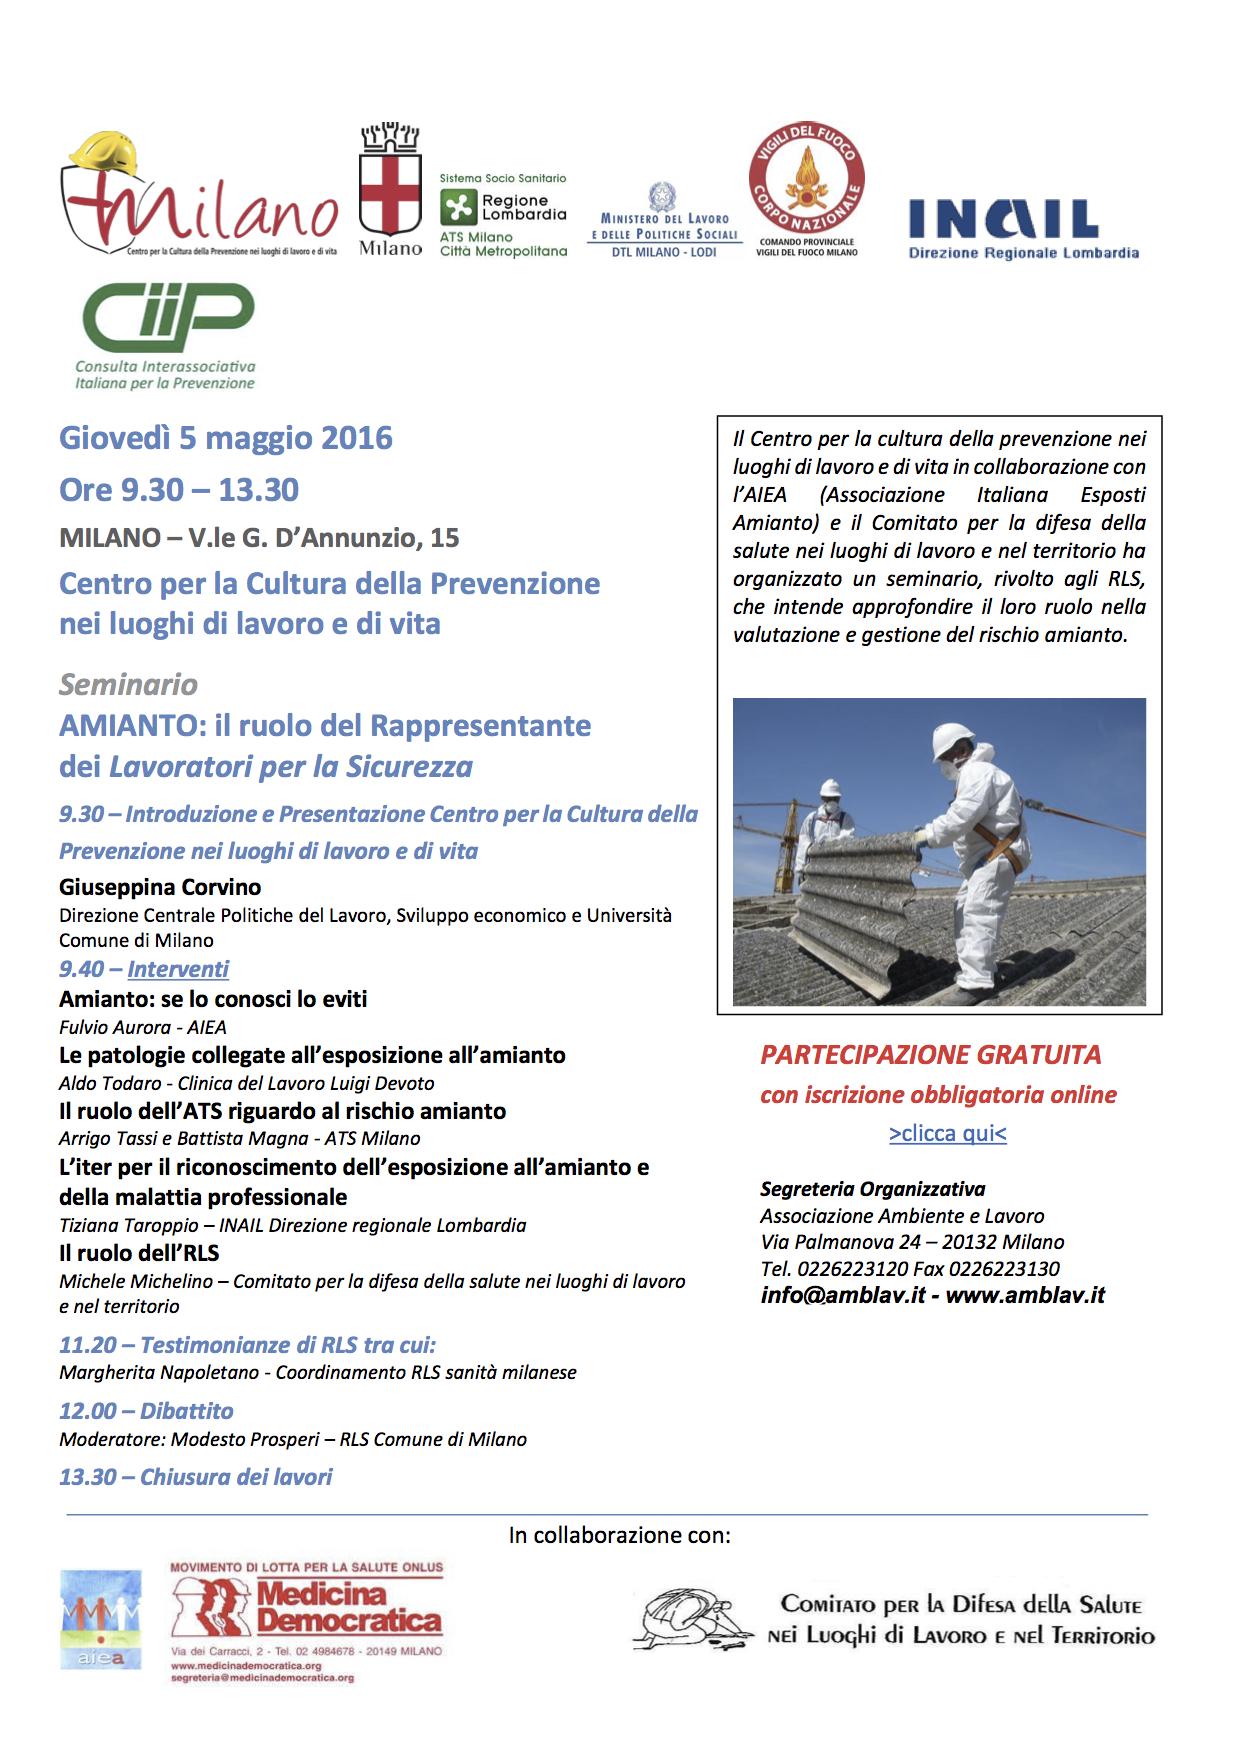 160505 seminario amianto (1)